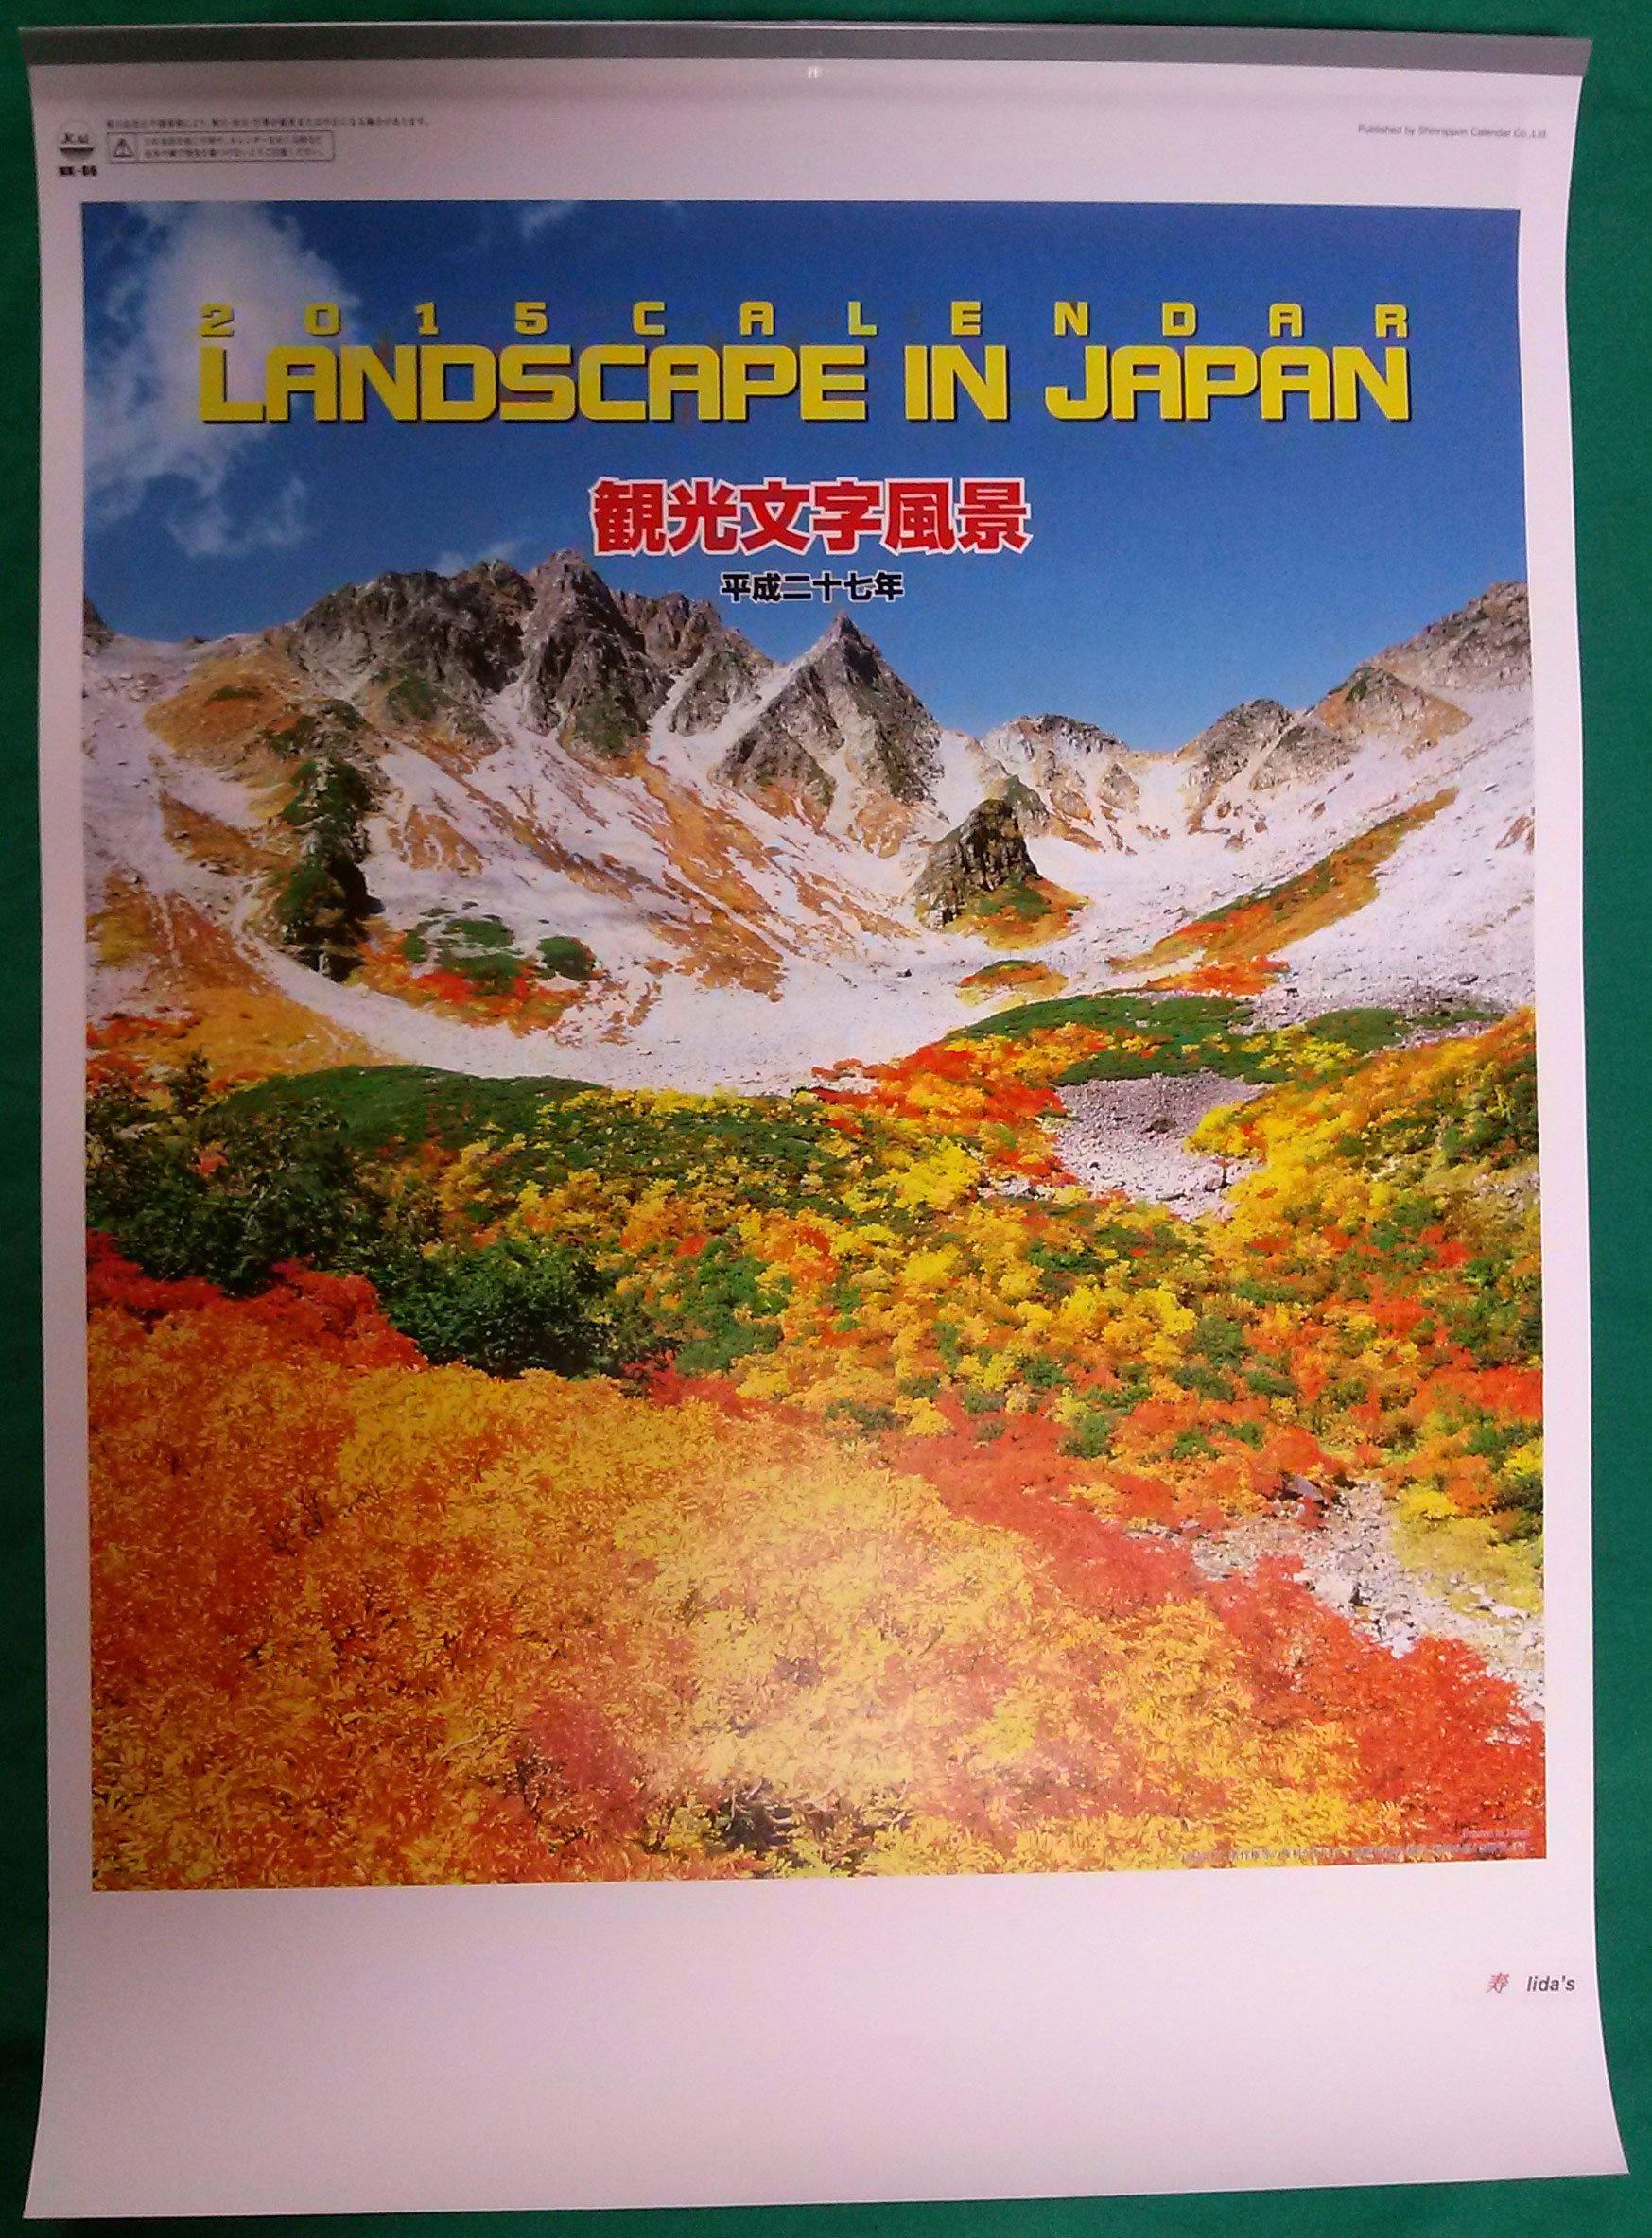 Landscape in Japan calendar in Honolulu, HI